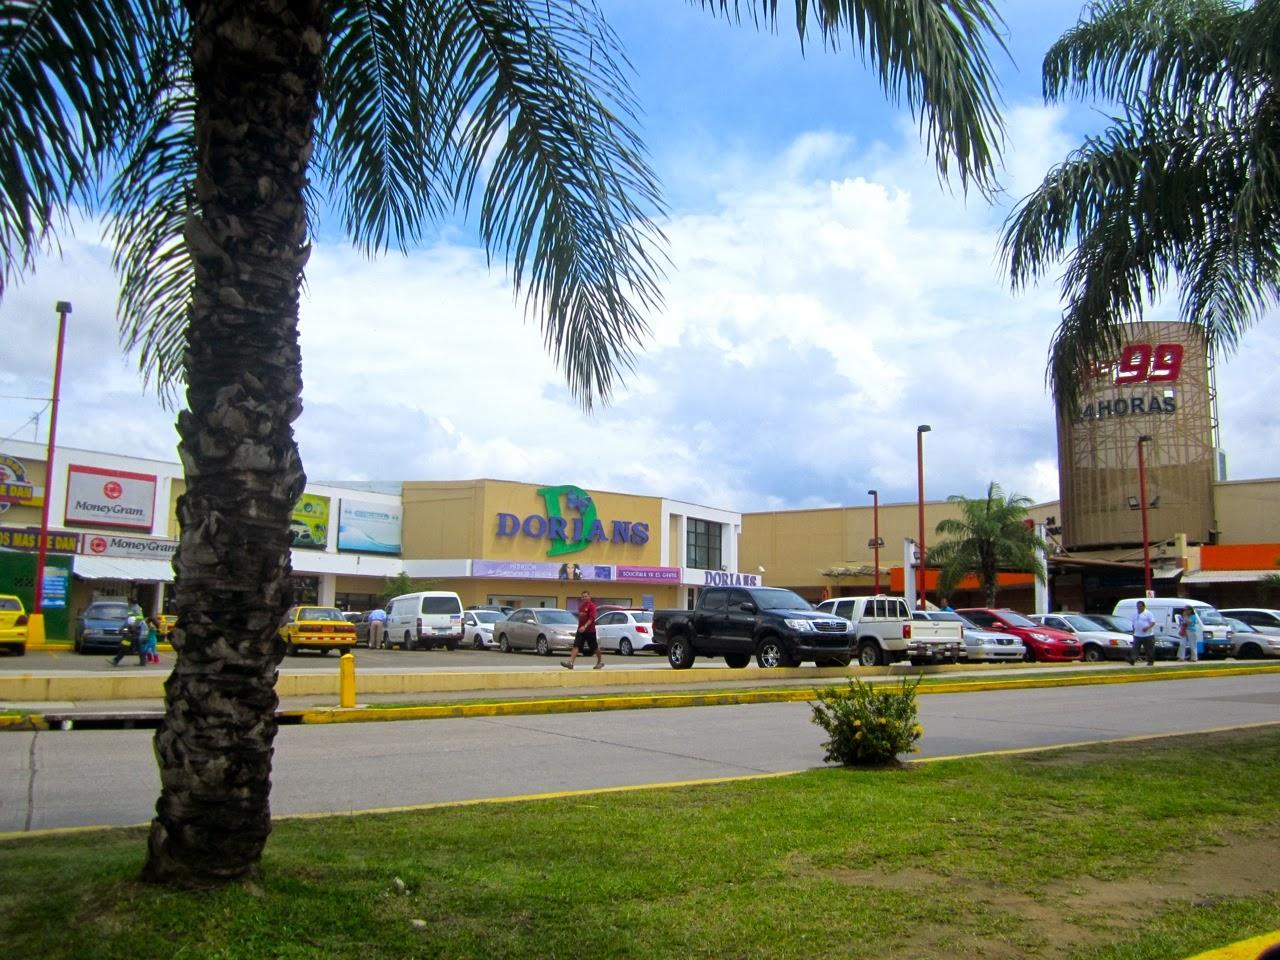 real bargain shopping in panama city panama u2013 panama for real